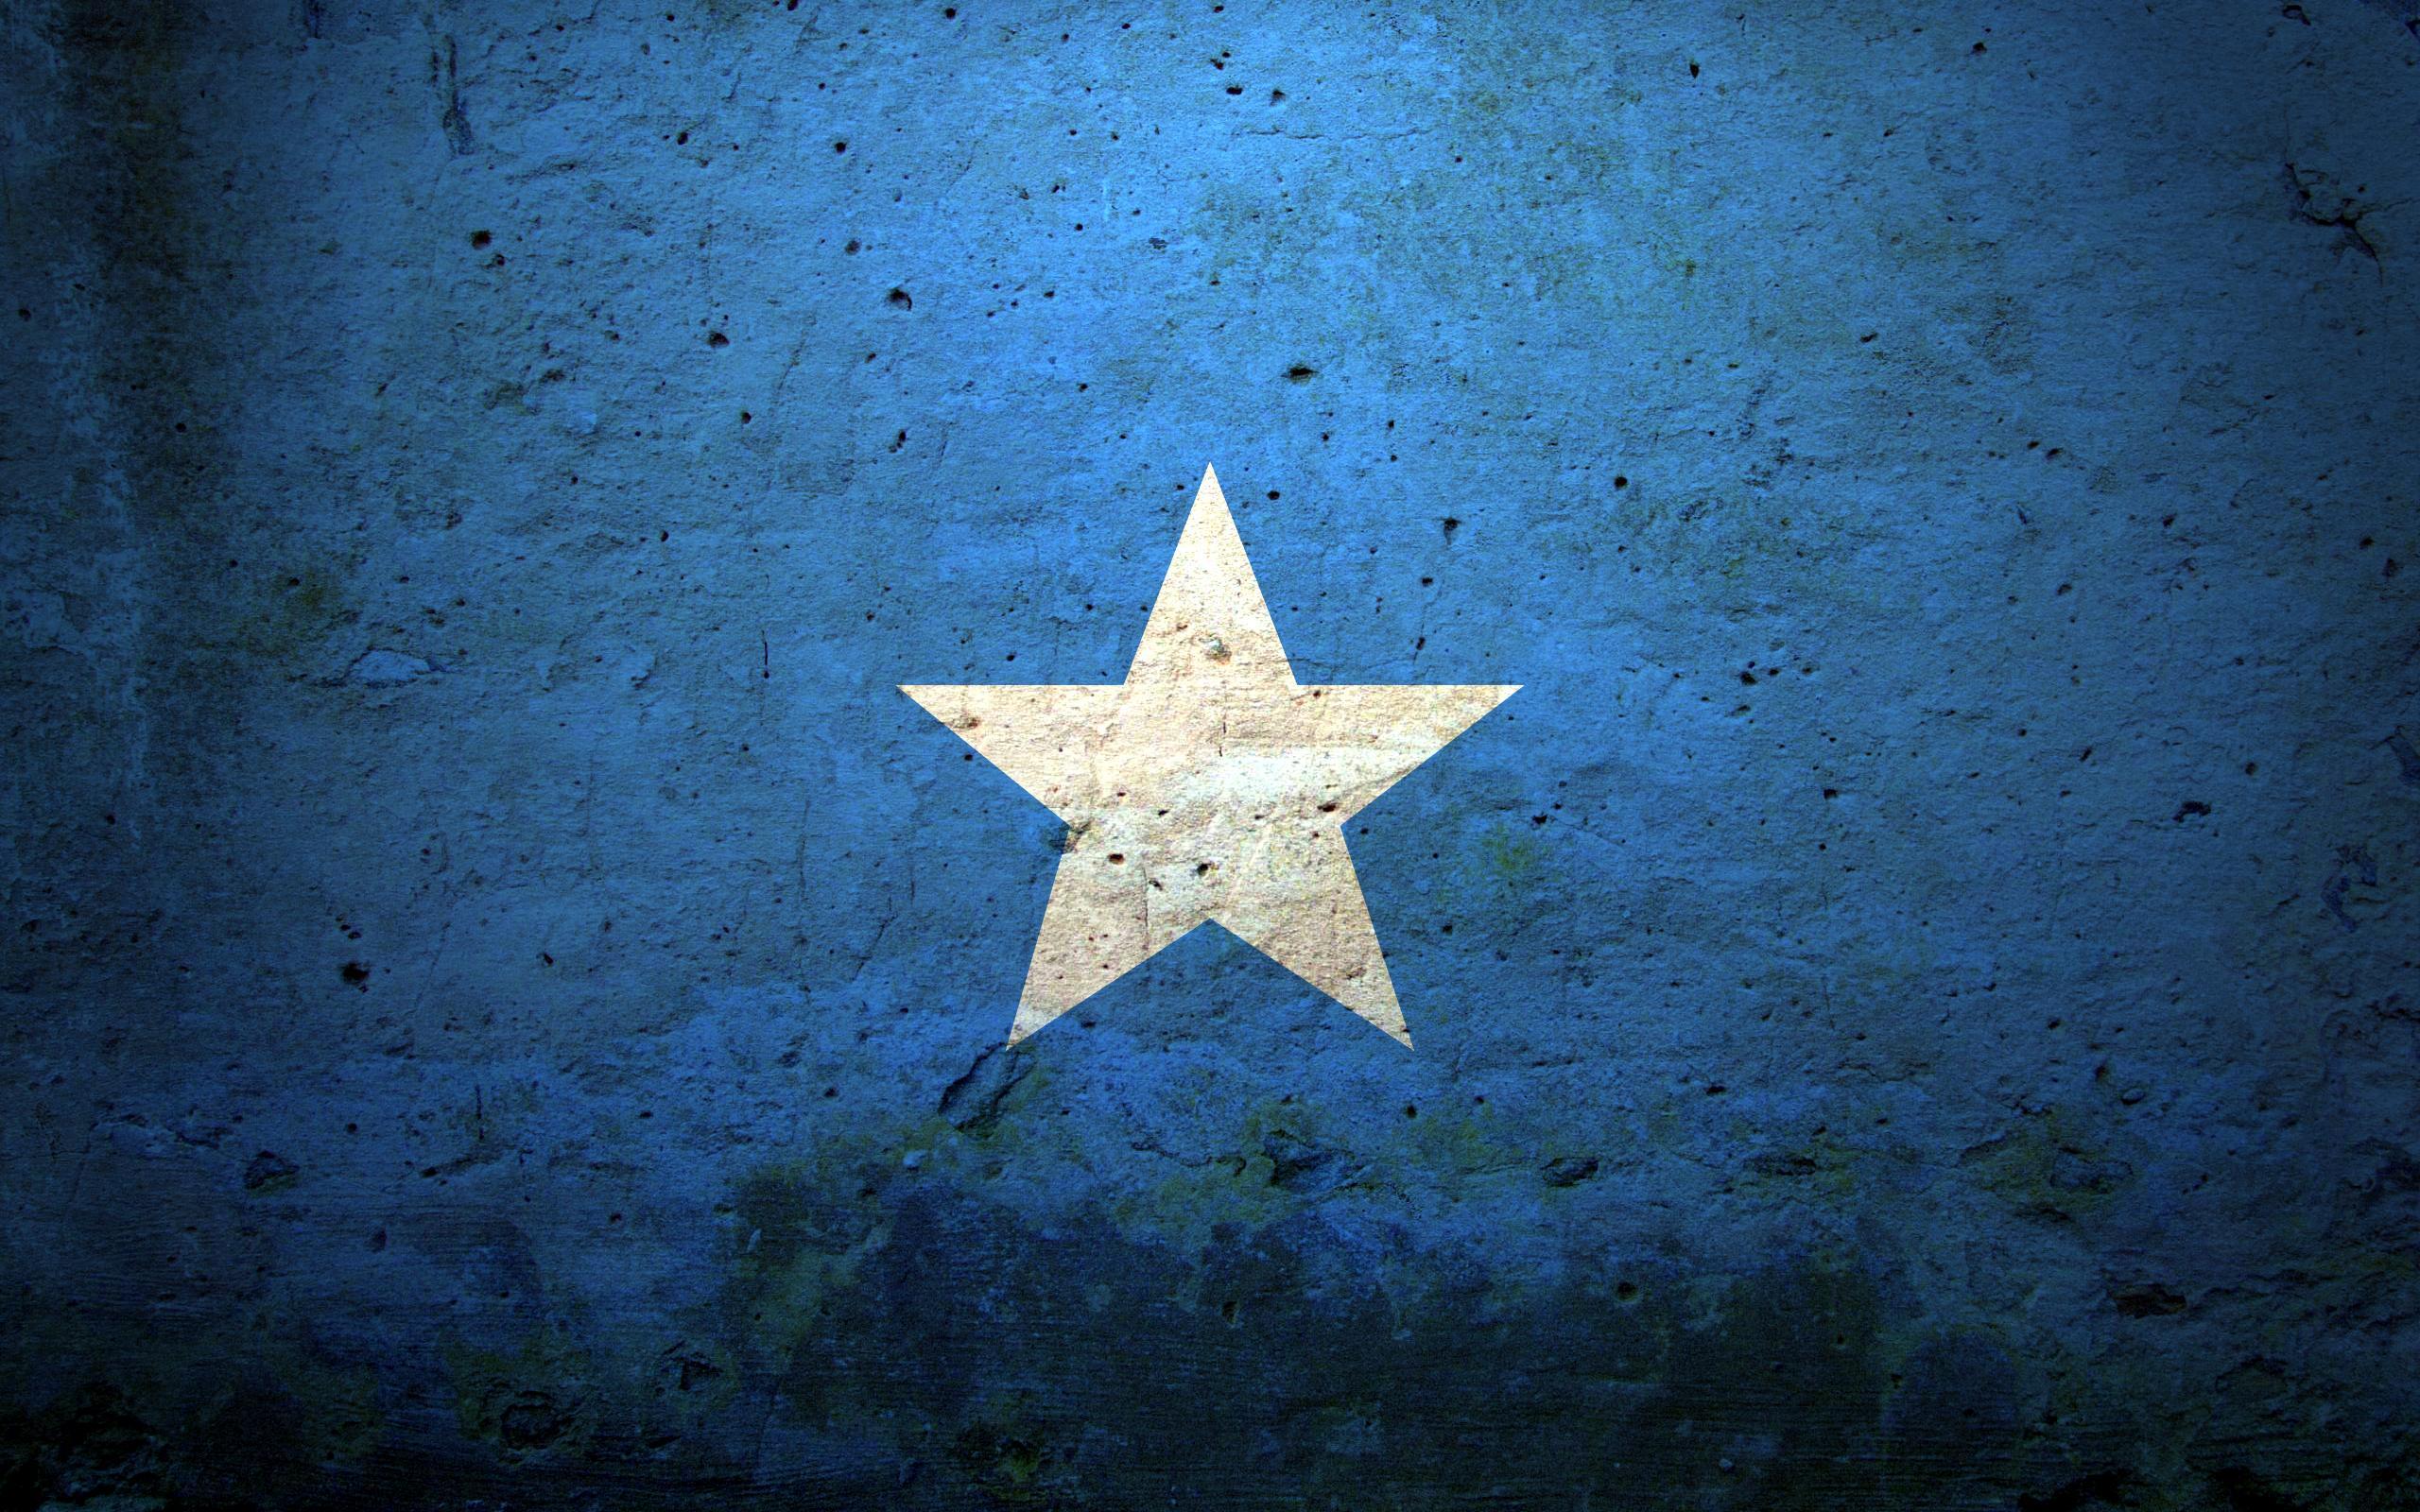 Star wallpaper 10080 2560x1600 px for Star wallpaper